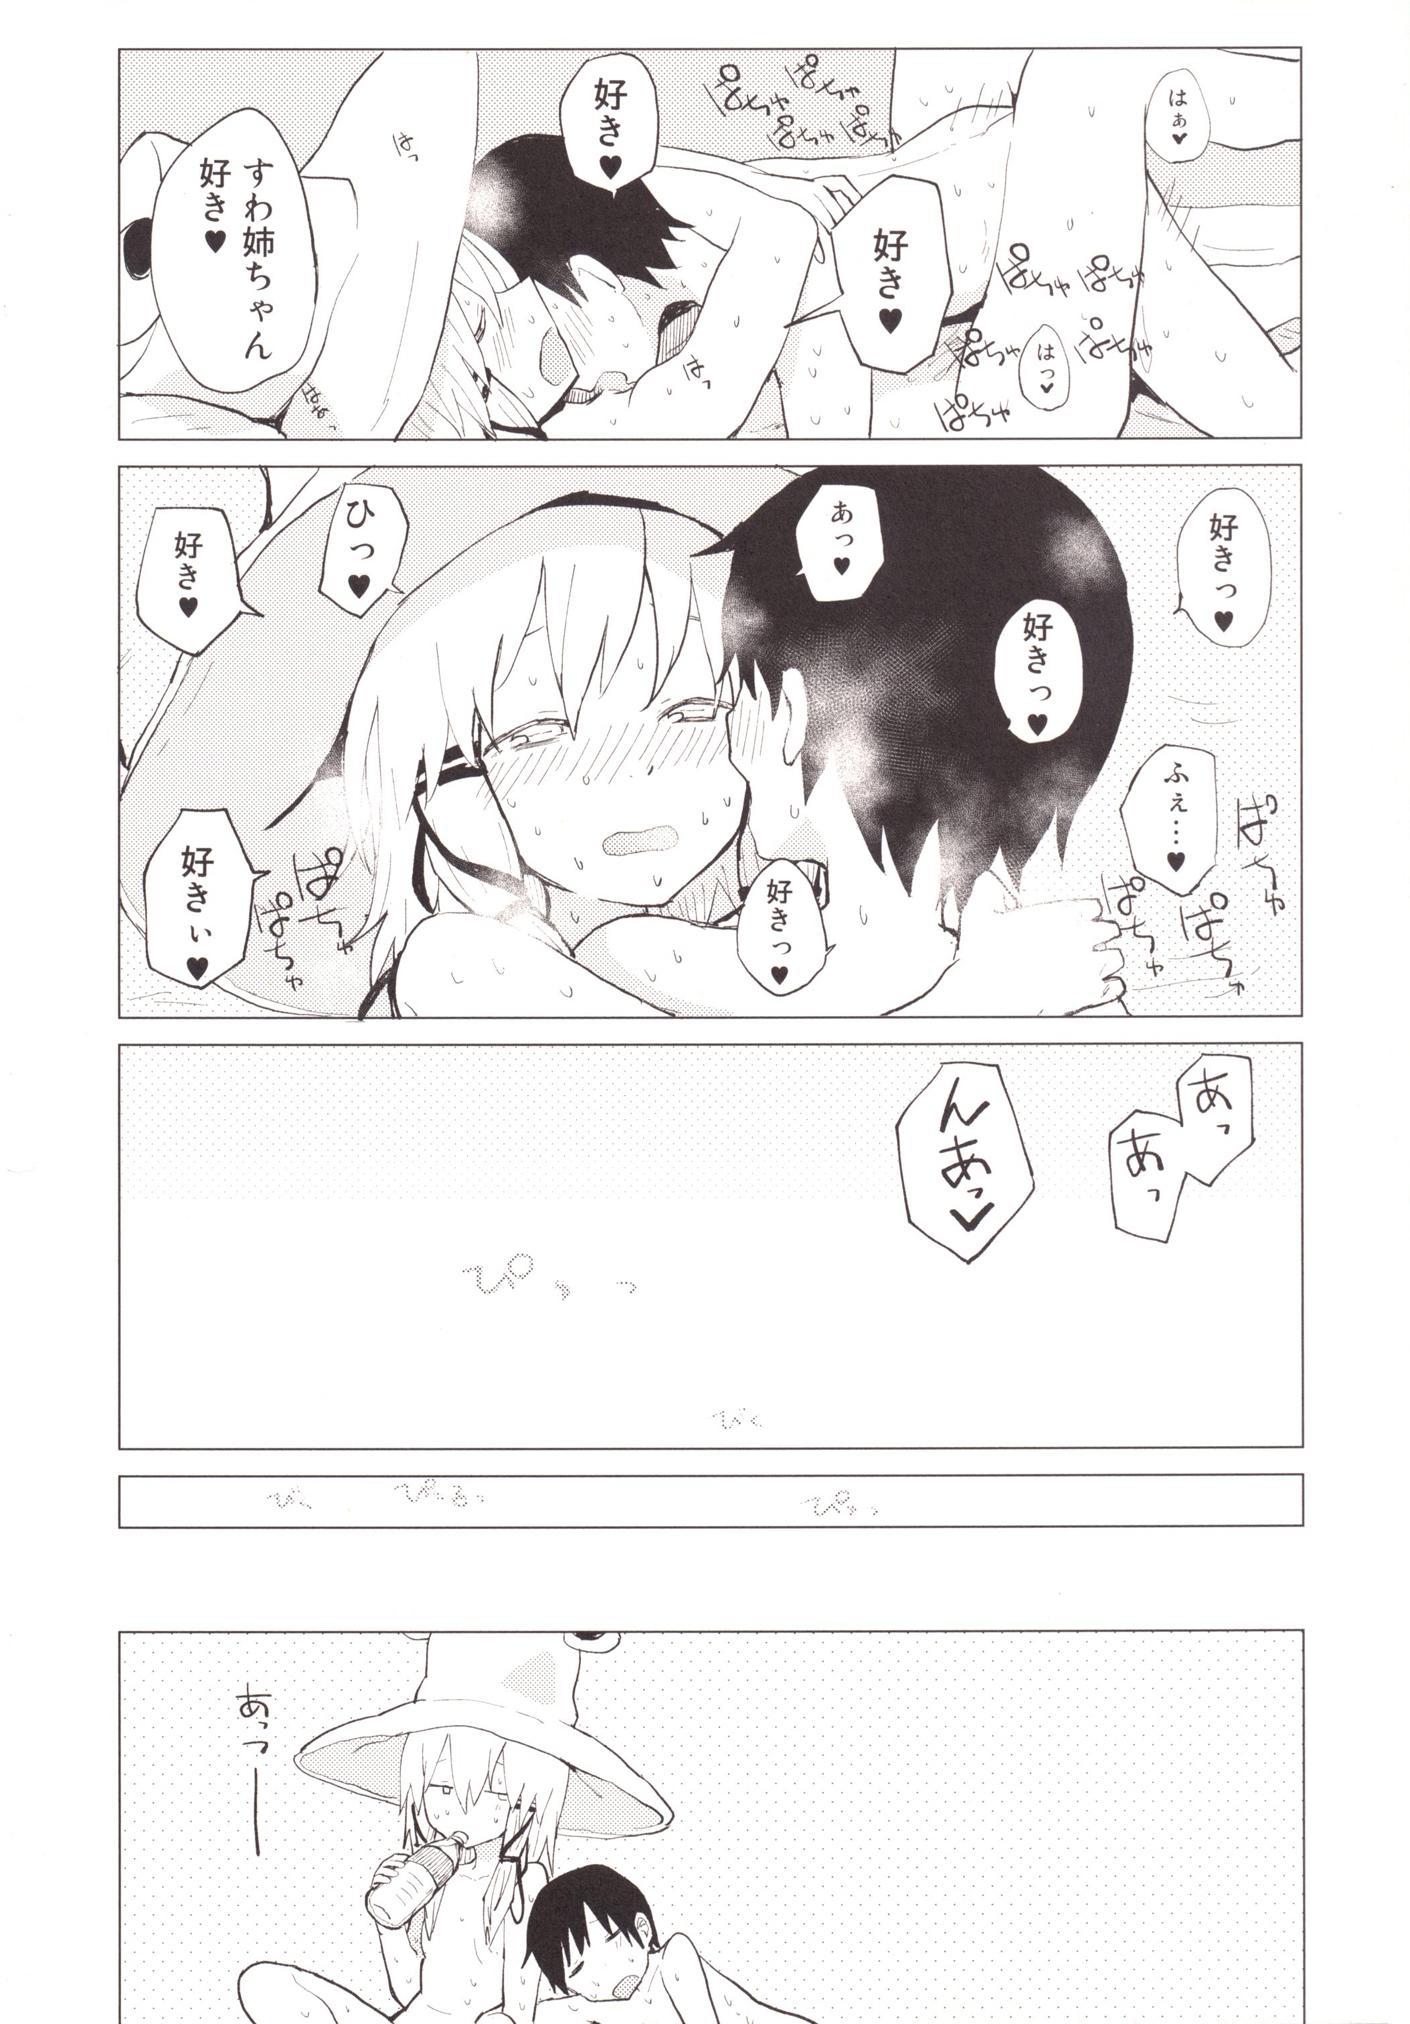 Suwa Shota Tsumeawase Suwa Shota Bangaihen 6 5